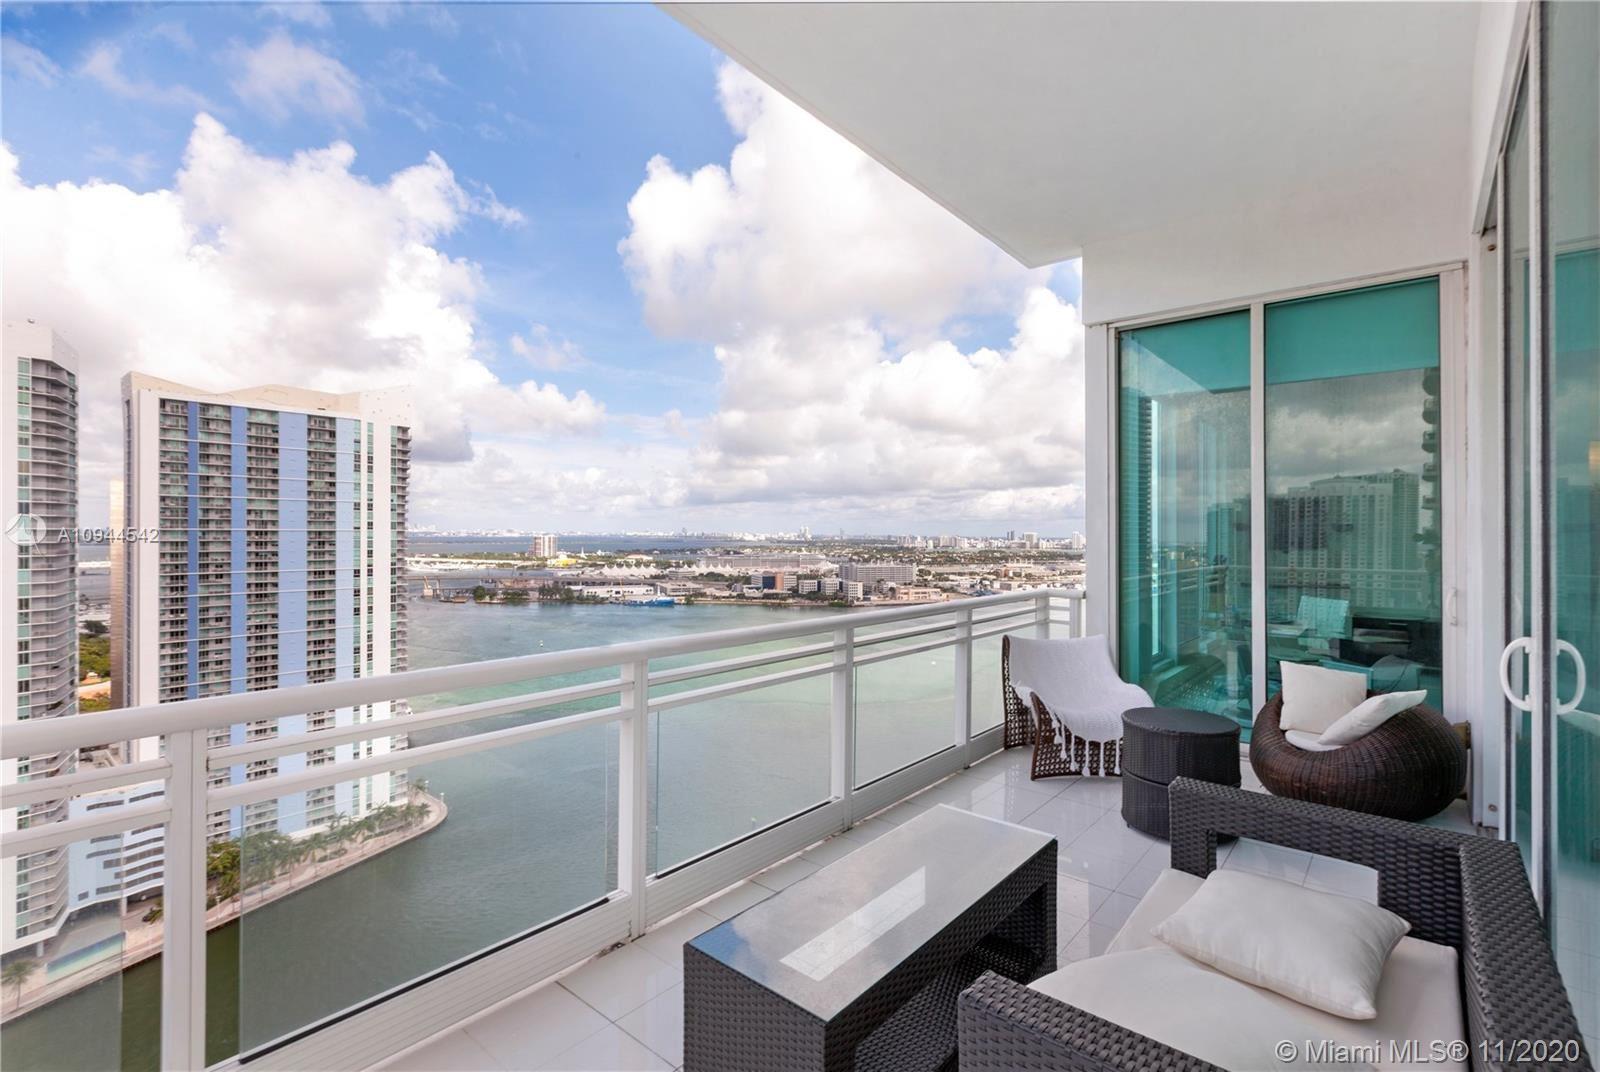 900 Brickell Key Blvd #2601, Miami, FL 33131 - #: A10944542